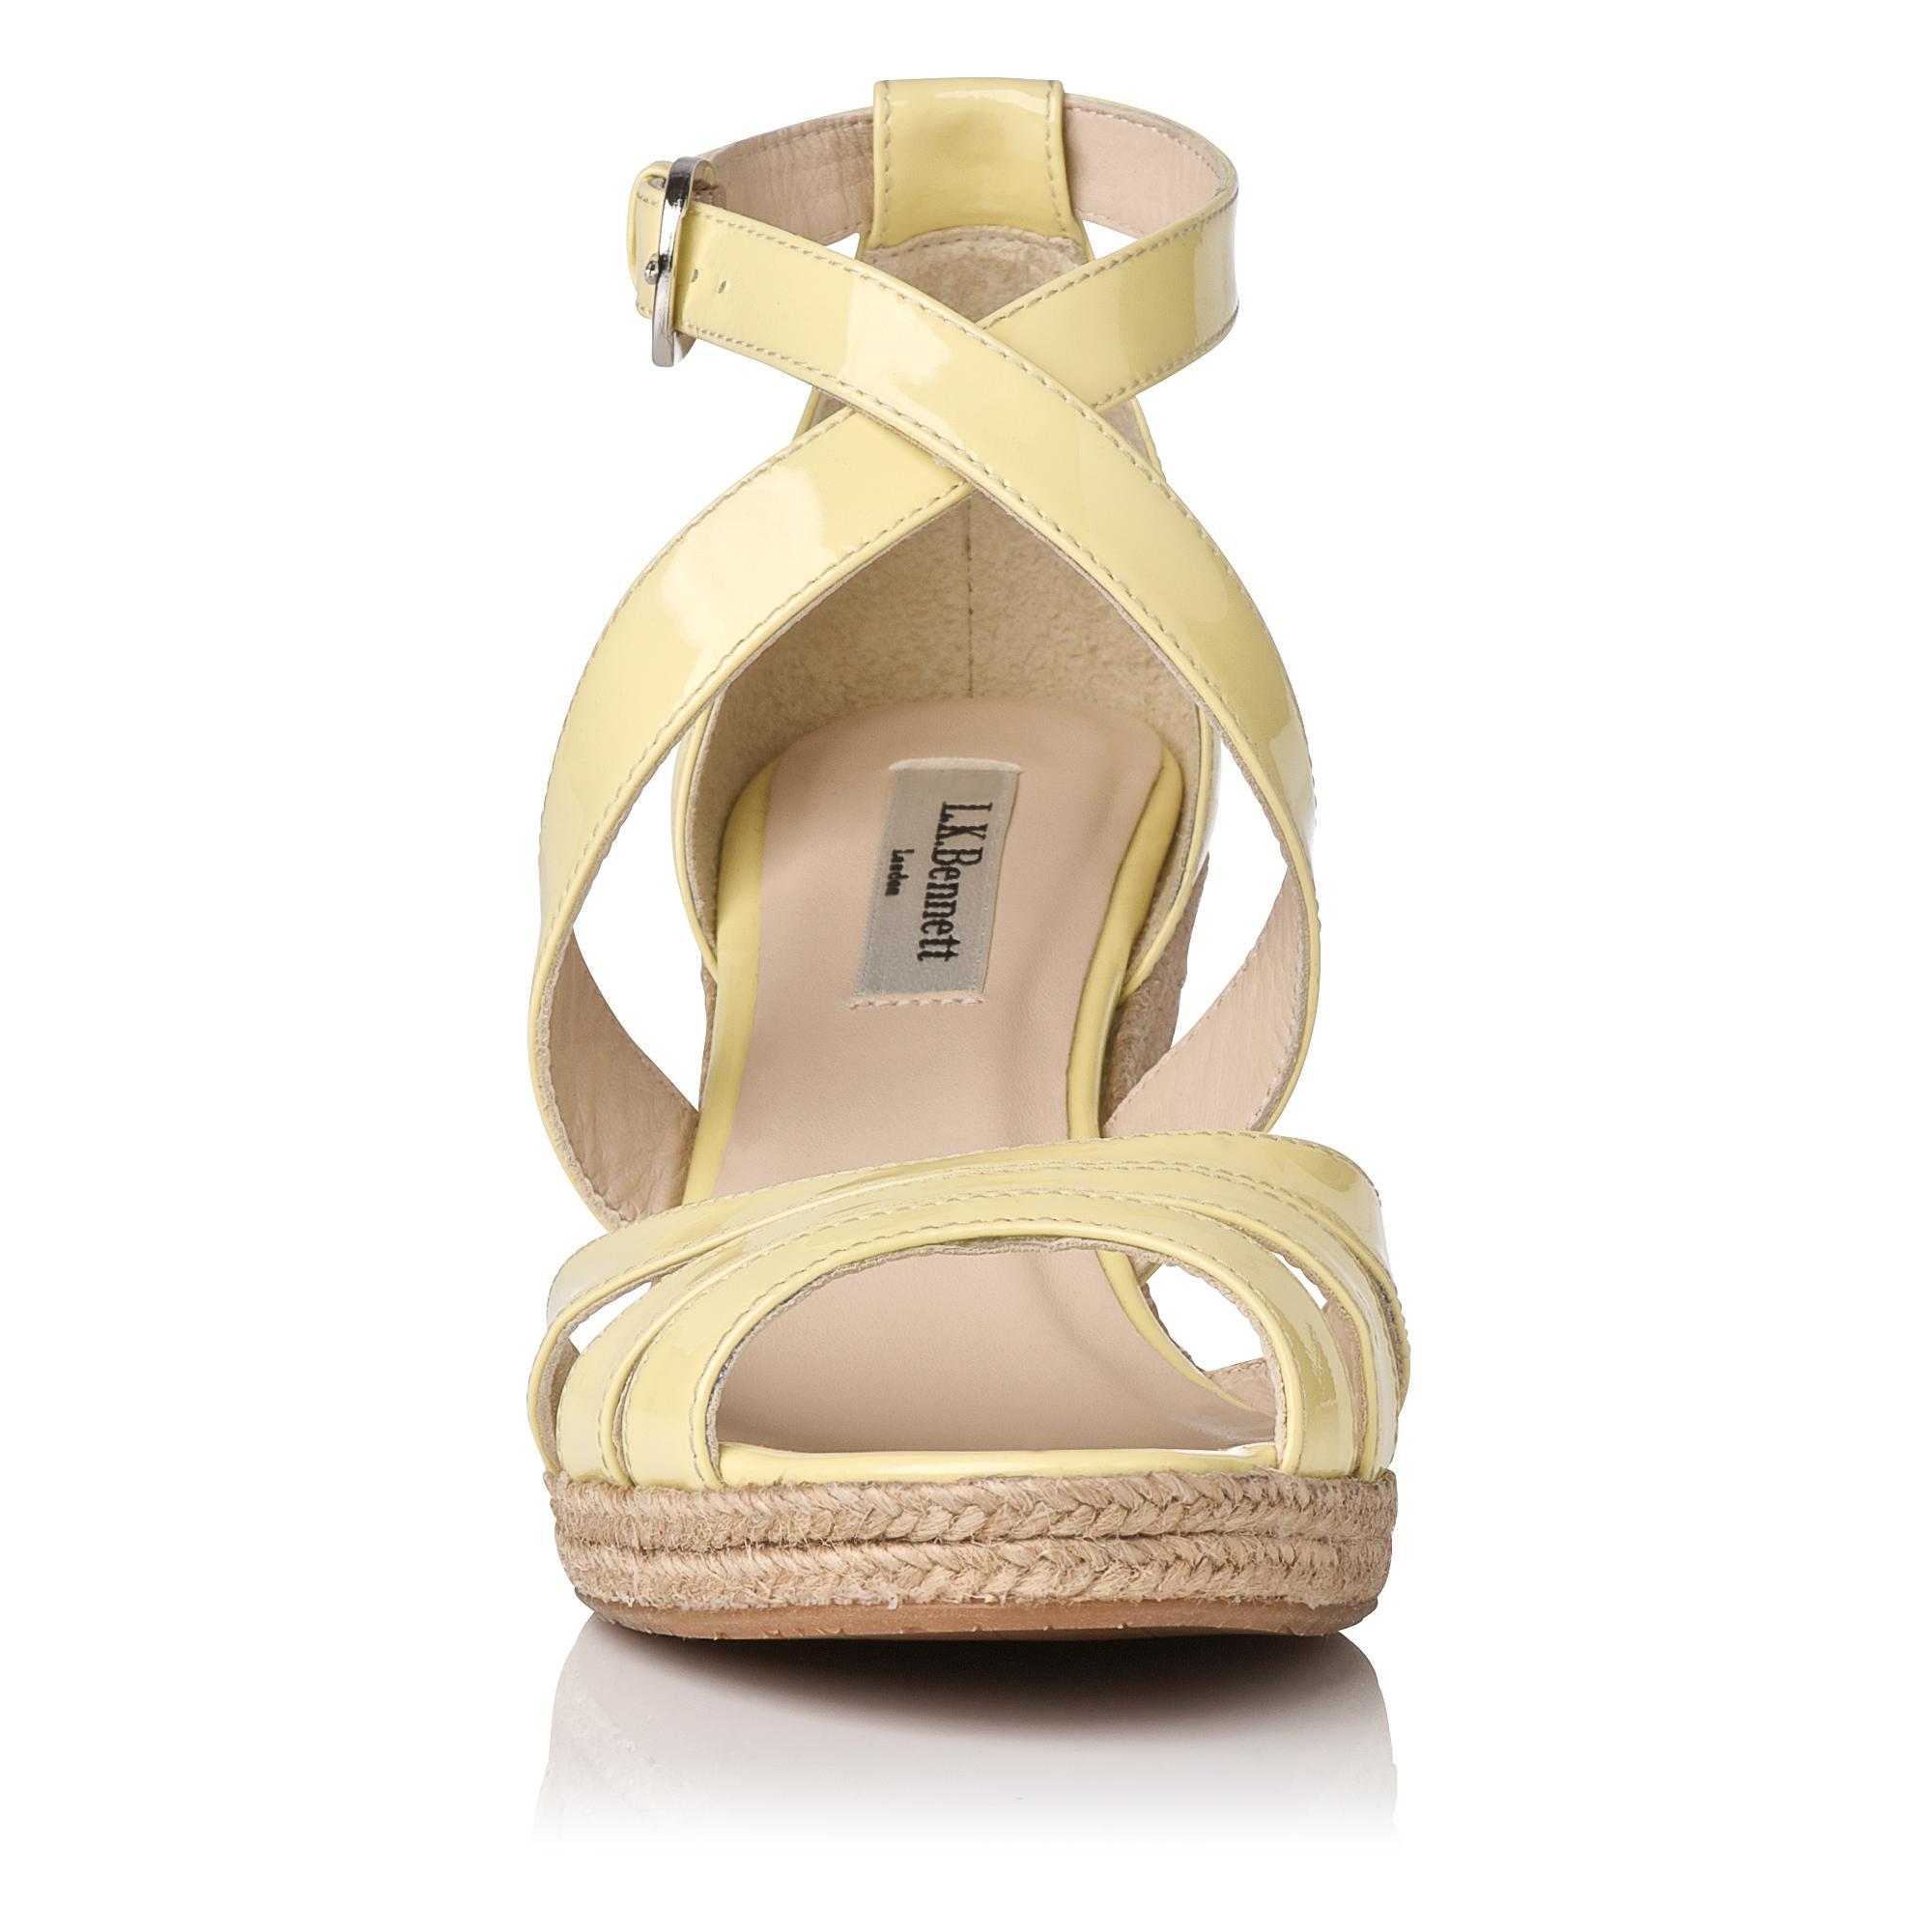 bdd24341291 ... Sandals  Priya Leather Espadrille Wedge. Tap to zoom